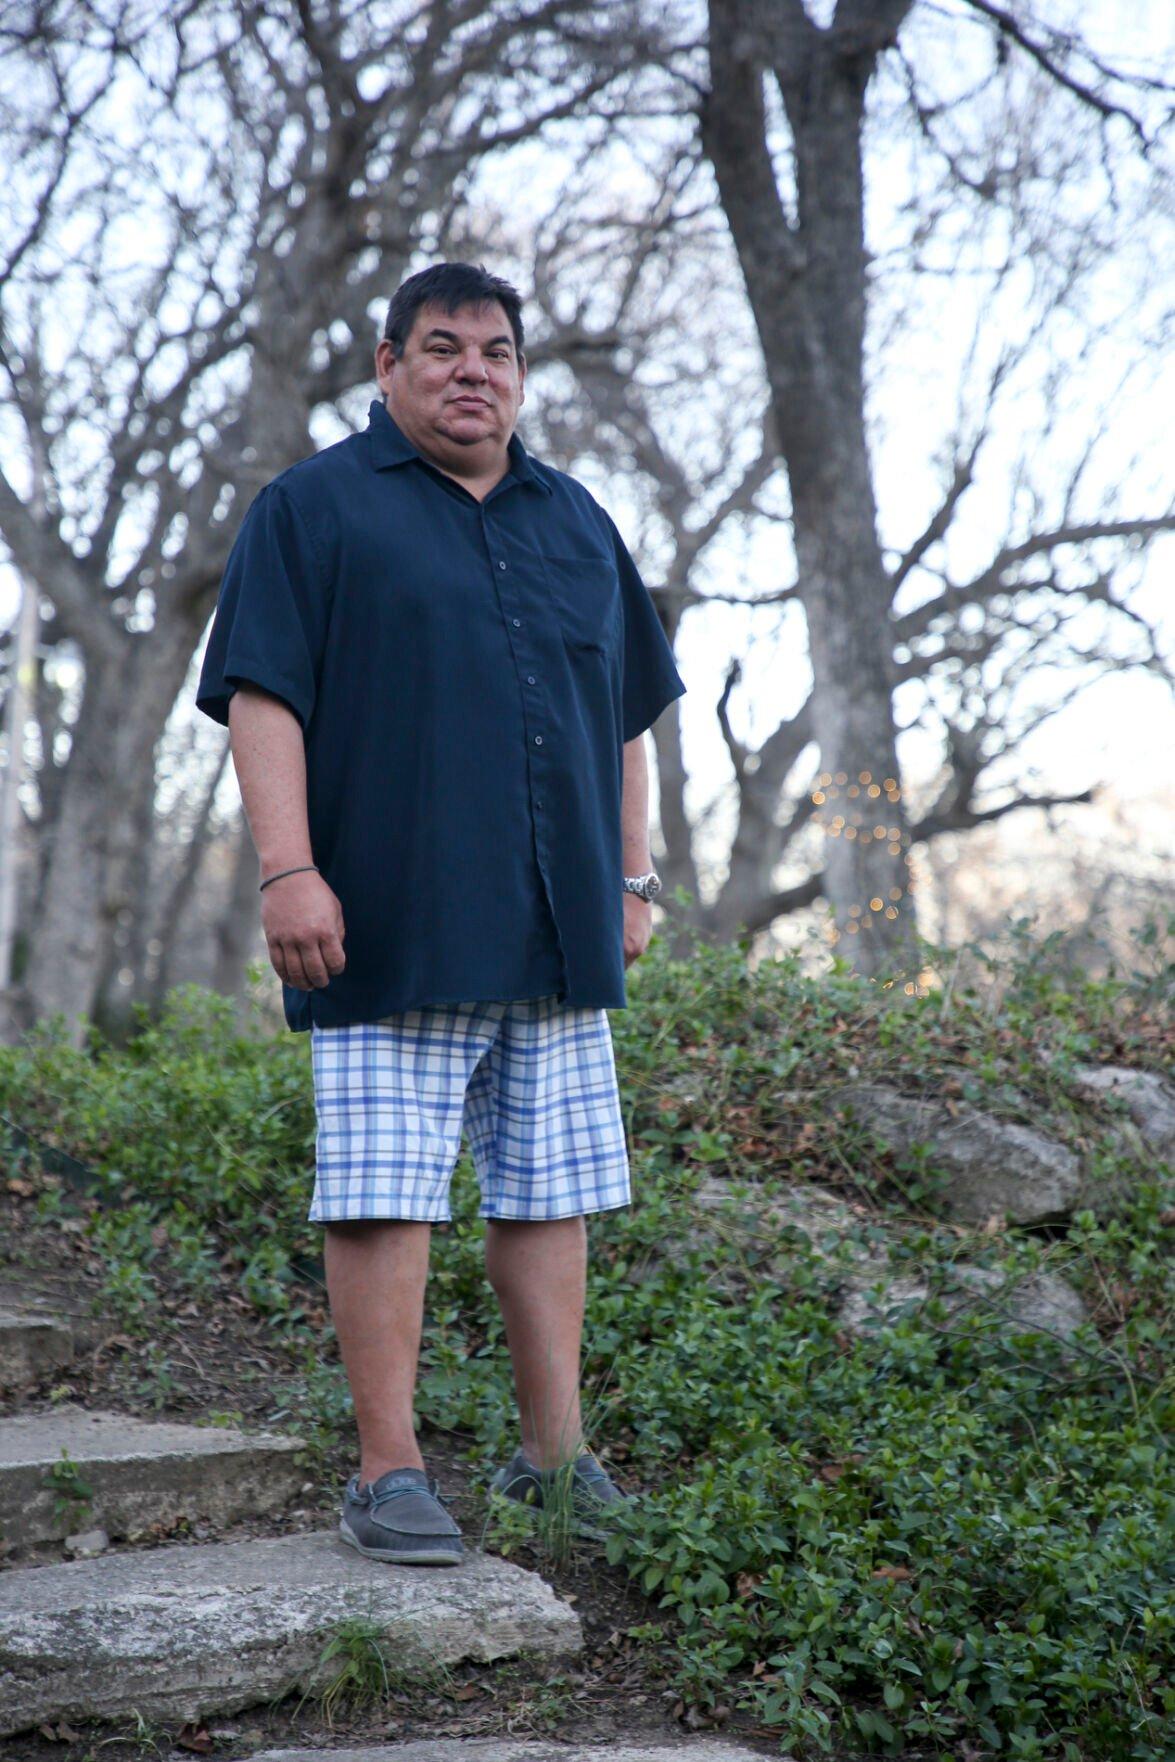 Cherokee Nation Councilor Joe Deere